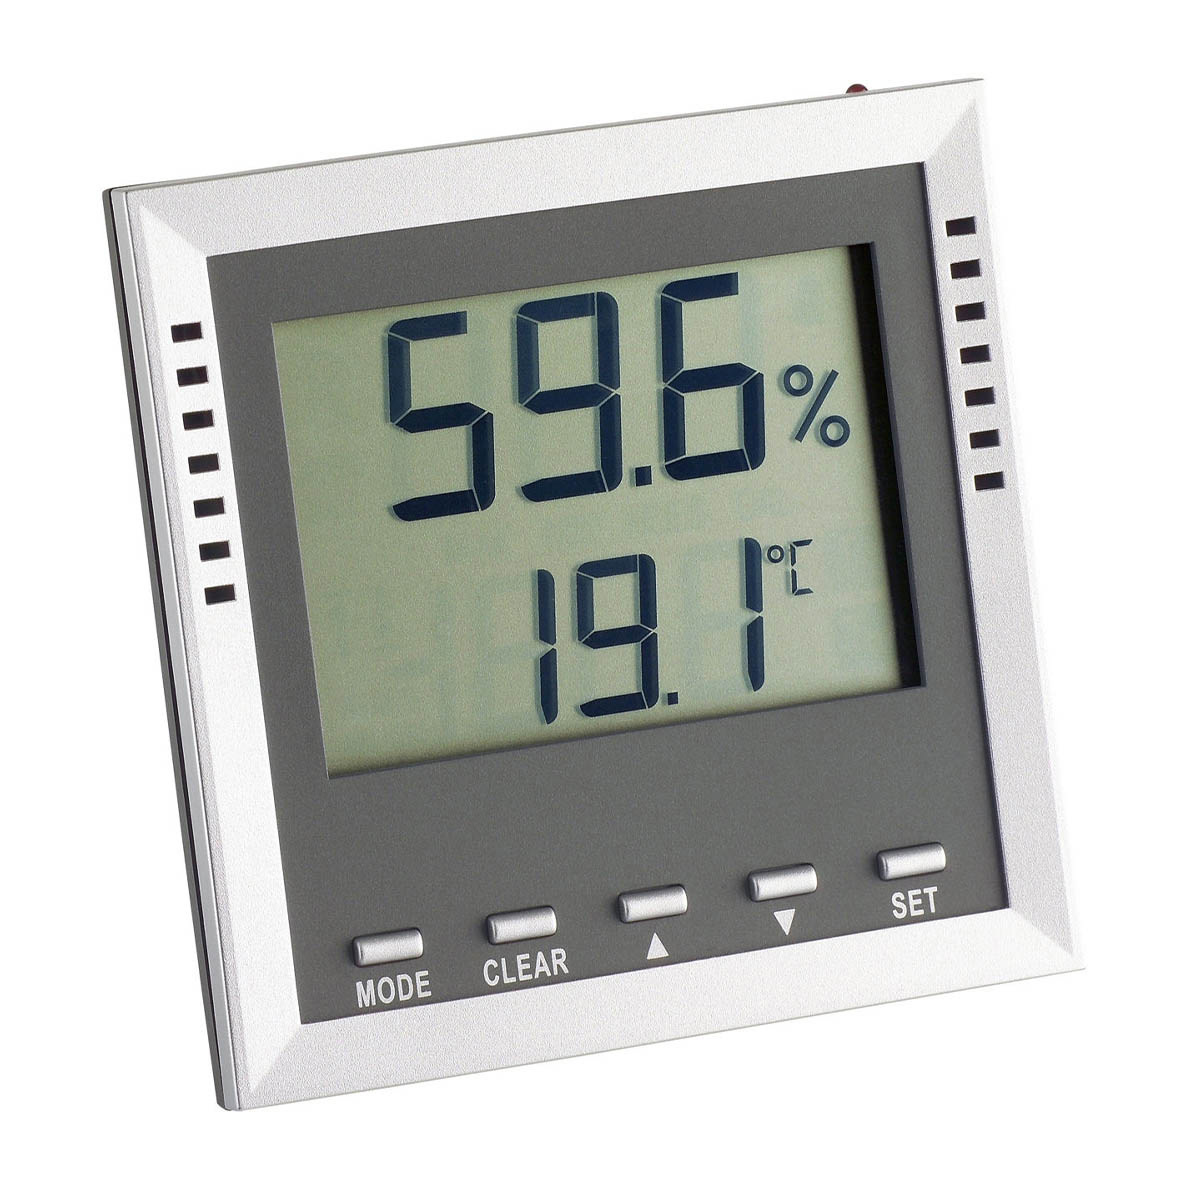 30-5010-digitales-thermo-hygrometer-klima-guard-1200x1200px.jpg